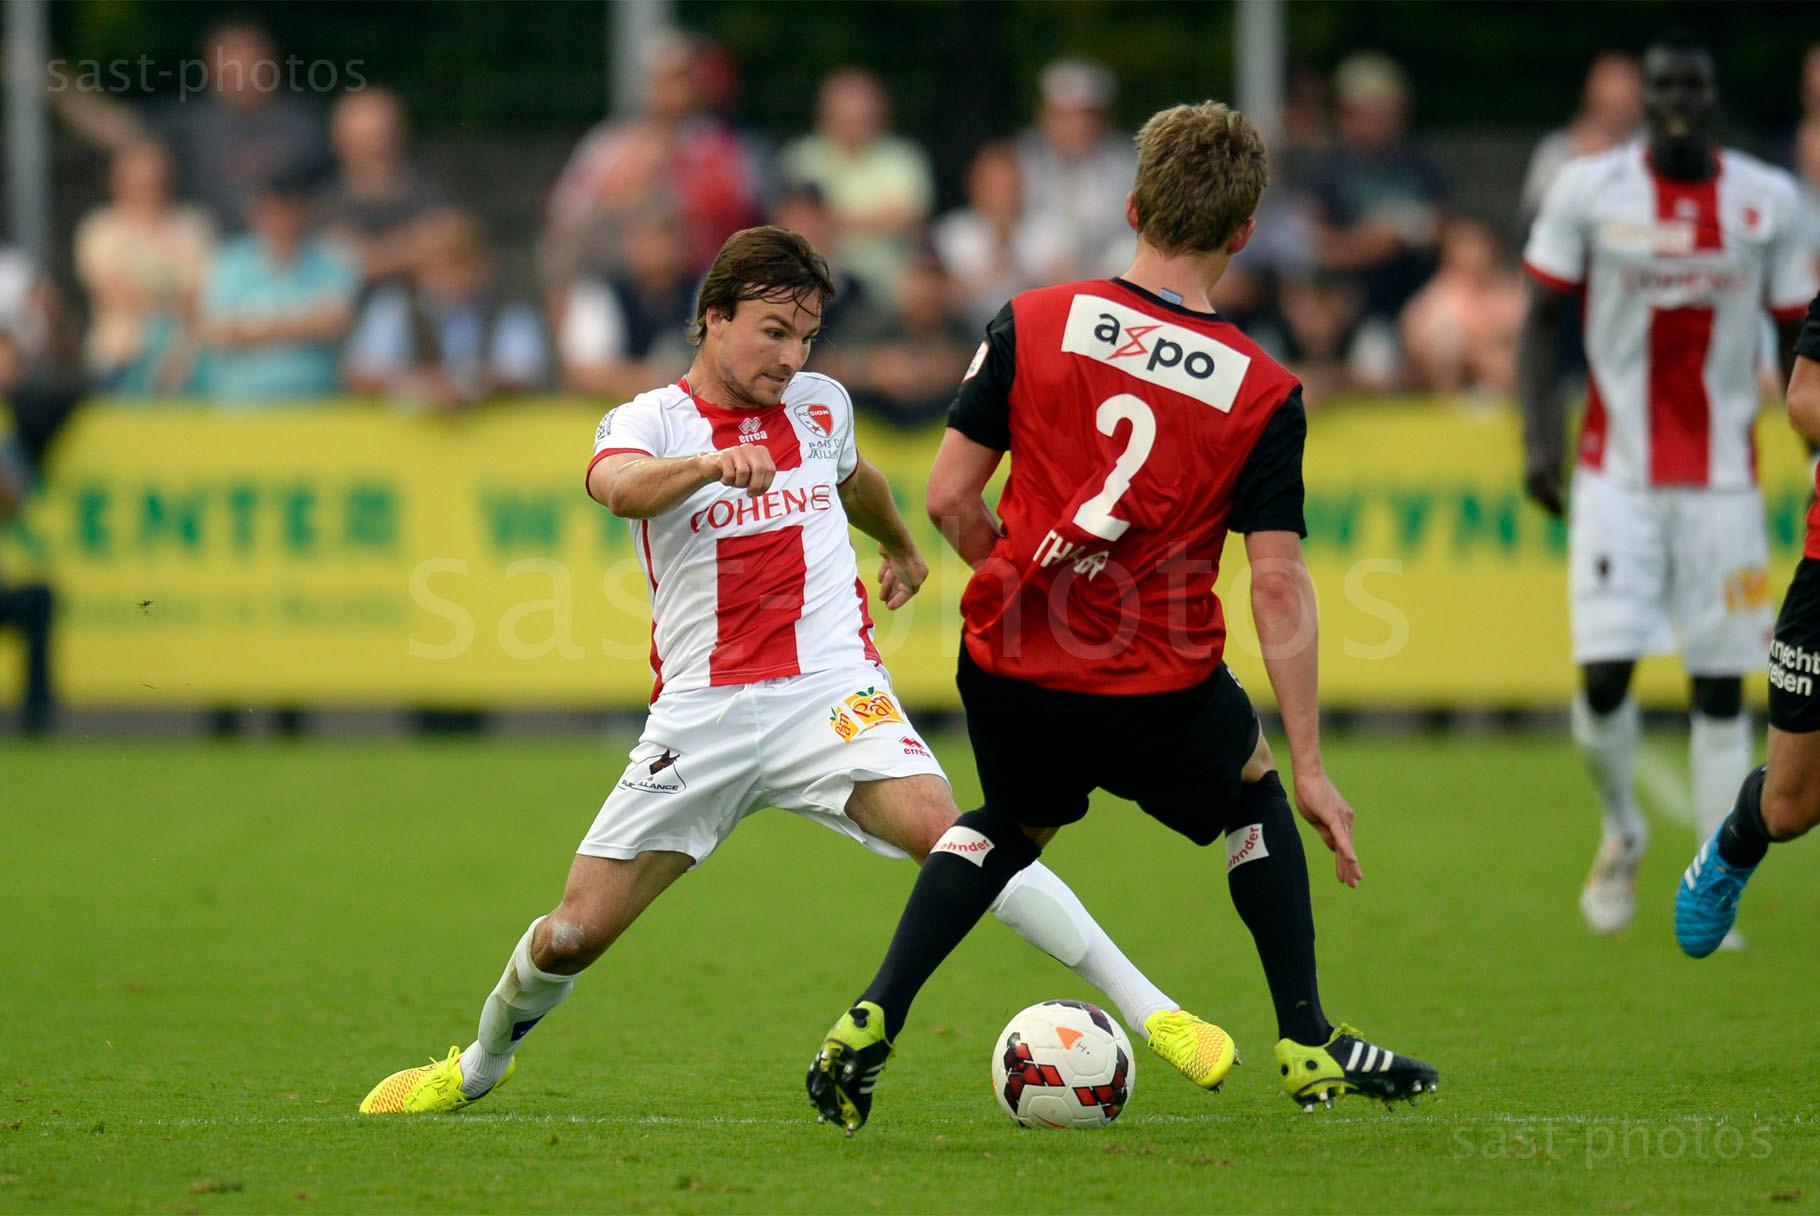 Michael Perrier (L. Sion) gegen Marco Thaler (Aarau)